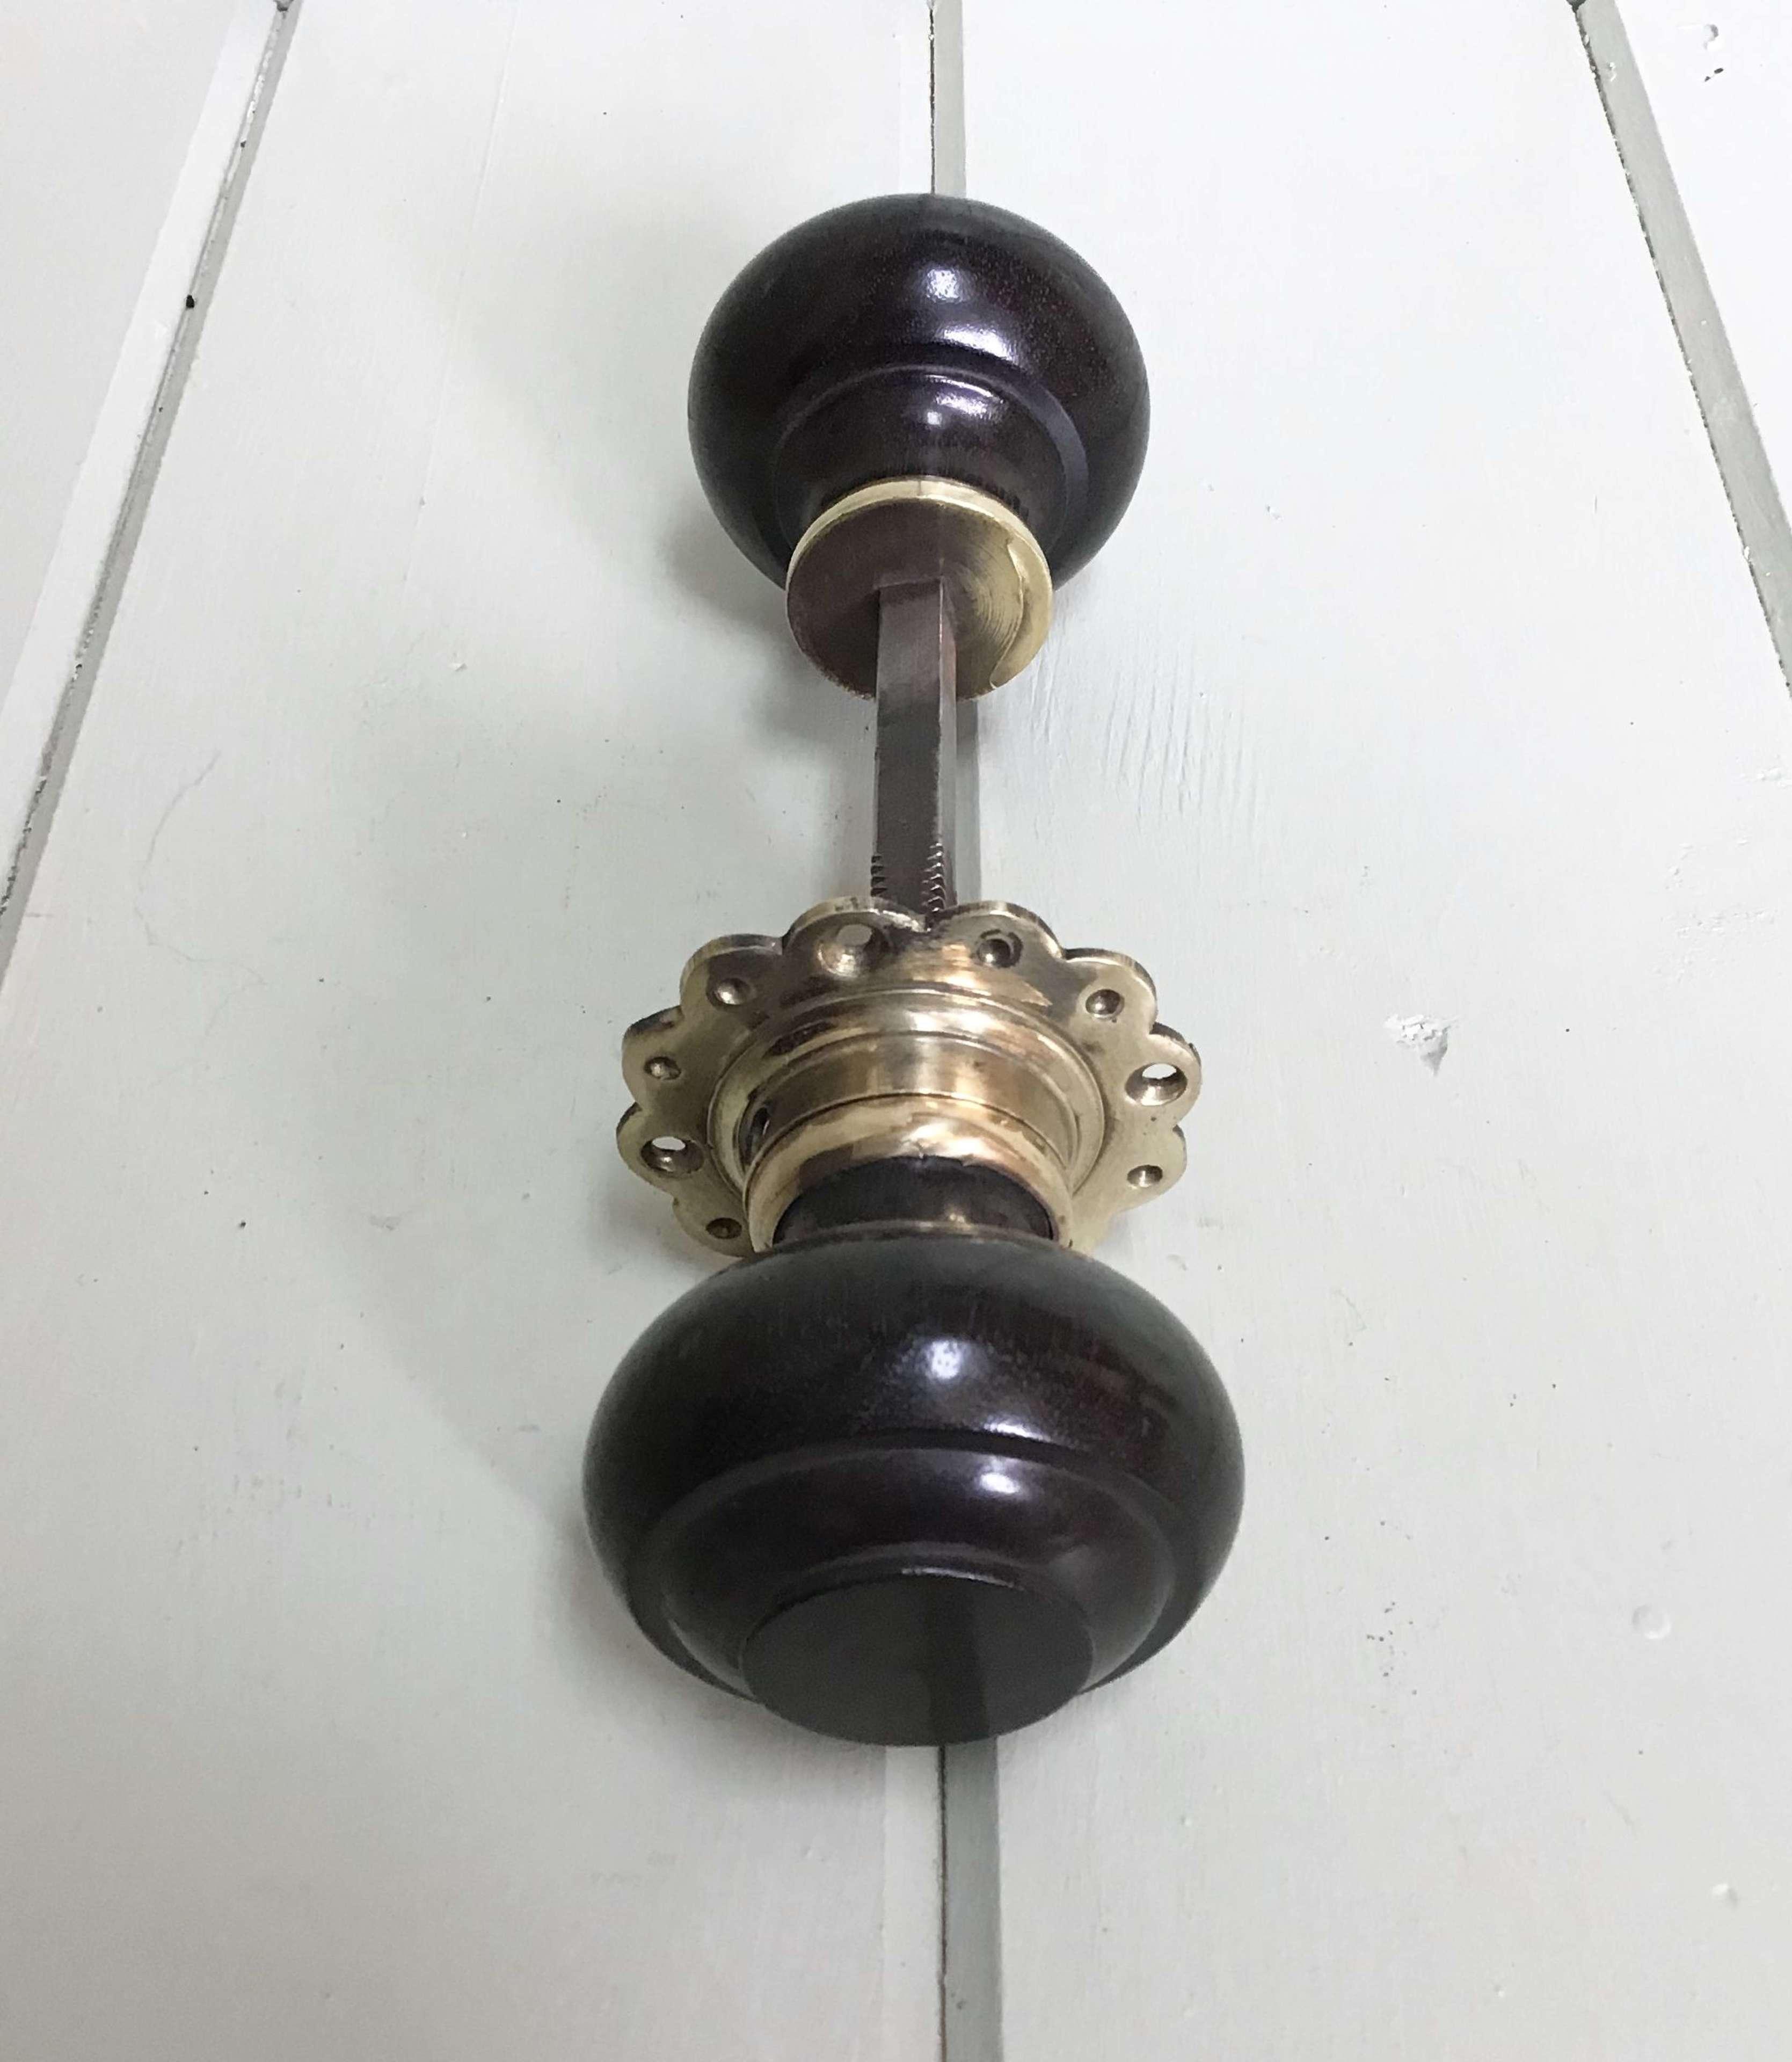 Genuine Pair of Edwardian/1920's Rosewood & Brass Door Knobs